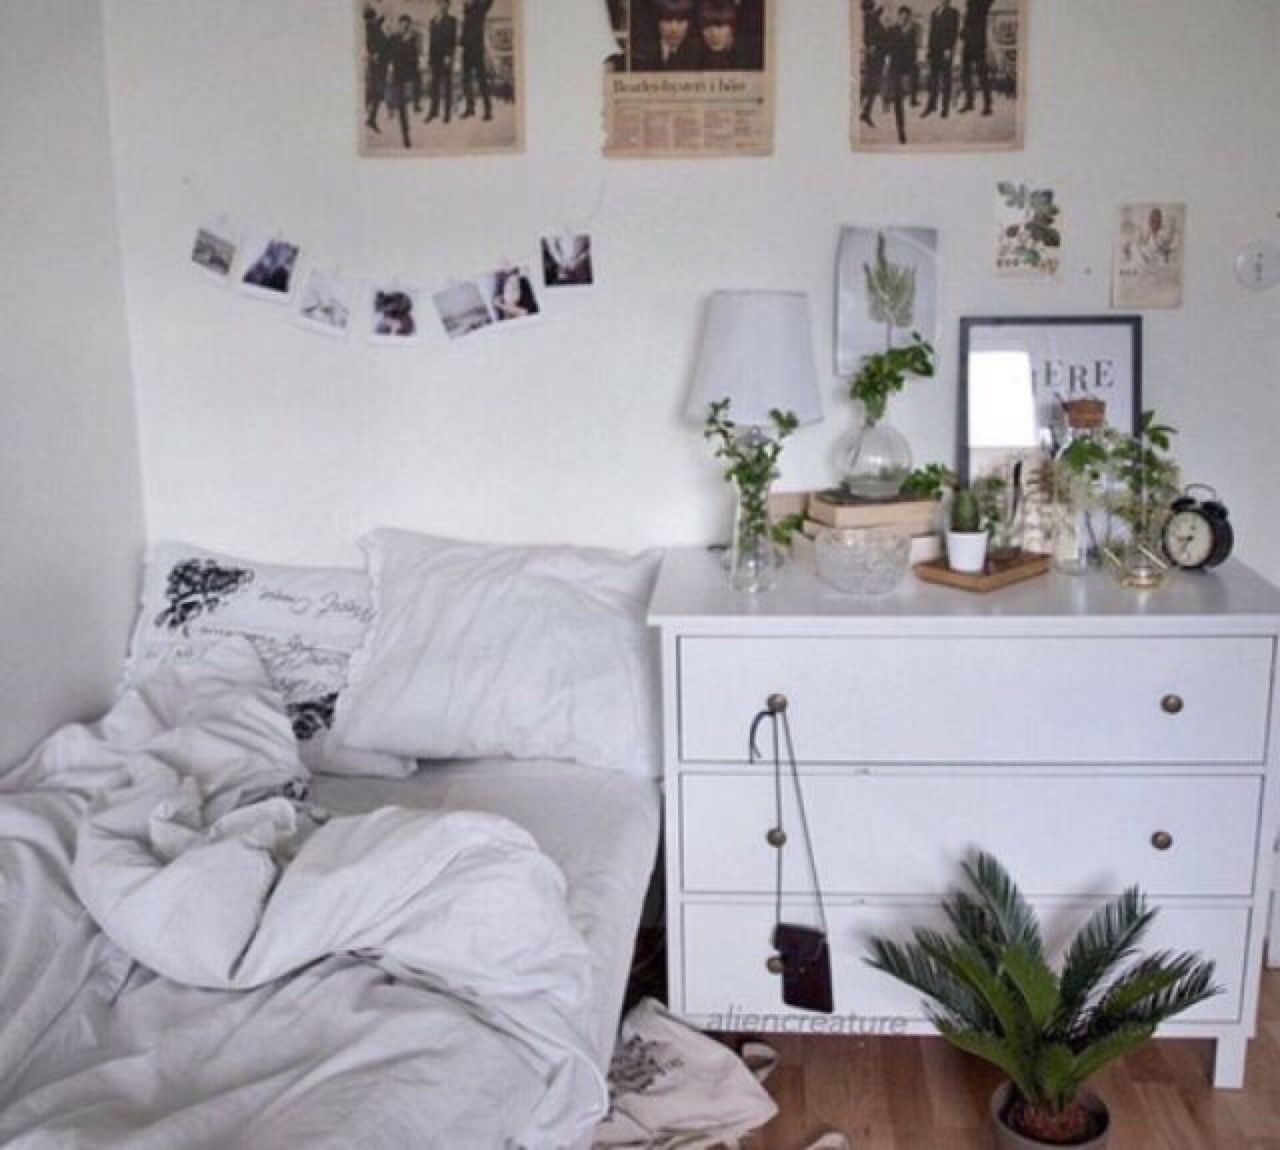 Diy Minimalist Style Room Decor Tumblr Aesthetic Inspired Cute766